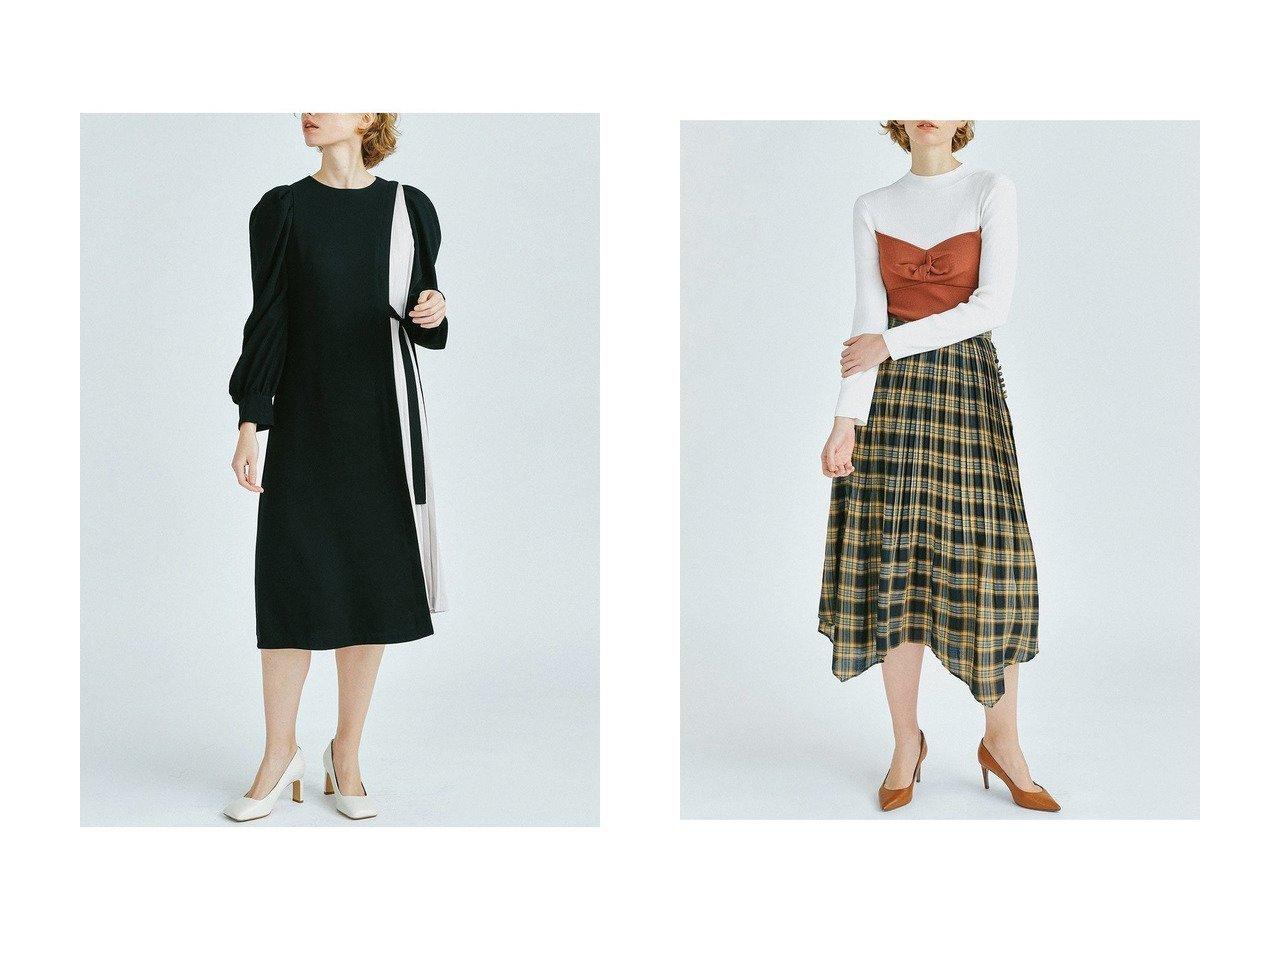 【LANVIN en Bleu/ランバン オン ブルー】のブロードプリーツスカート&マトンスリーブワンピース LANVIN en Bleuのおすすめ!人気、トレンド・レディースファッションの通販 おすすめで人気の流行・トレンド、ファッションの通販商品 メンズファッション・キッズファッション・インテリア・家具・レディースファッション・服の通販 founy(ファニー) https://founy.com/ ファッション Fashion レディースファッション WOMEN ワンピース Dress スカート Skirt プリーツスカート Pleated Skirts 春 Spring コンビ シンプル ジョーゼット スリーブ ダブル トレンド 人気 バランス フォーマル プリーツ リボン ロング 2021年 2021 S/S 春夏 SS Spring/Summer 2021 春夏 S/S SS Spring/Summer 2021 |ID:crp329100000019527